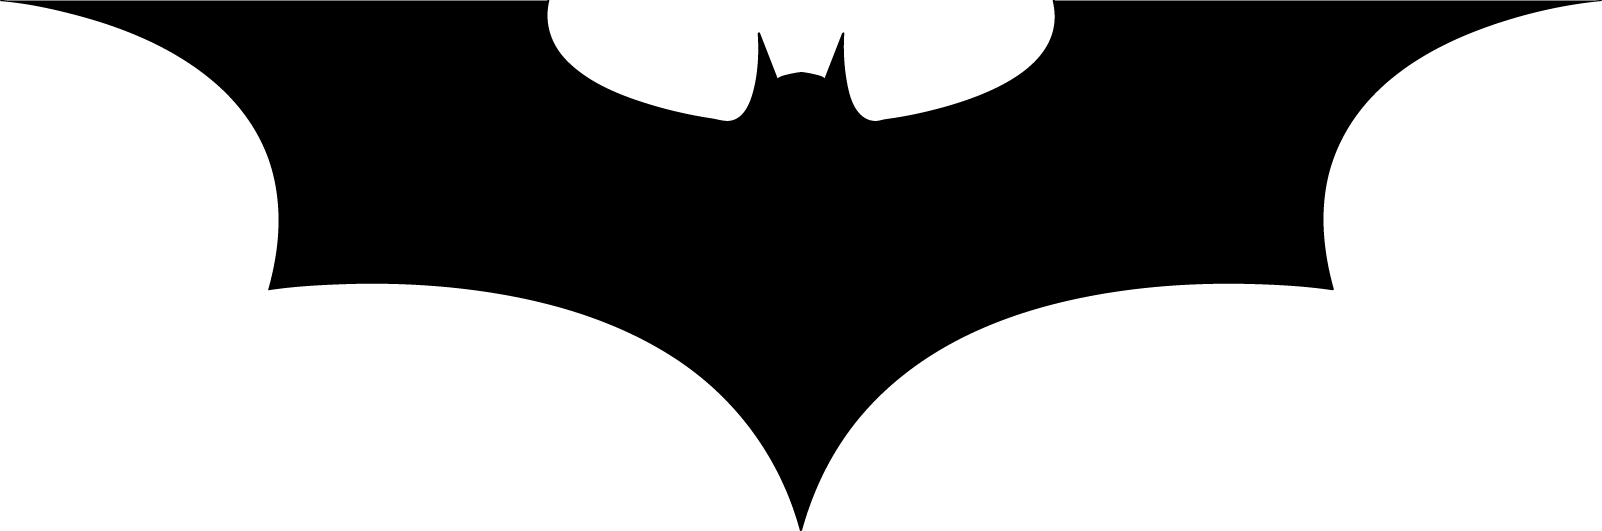 The Dark Knight Vector by TheMonoTM on deviantART